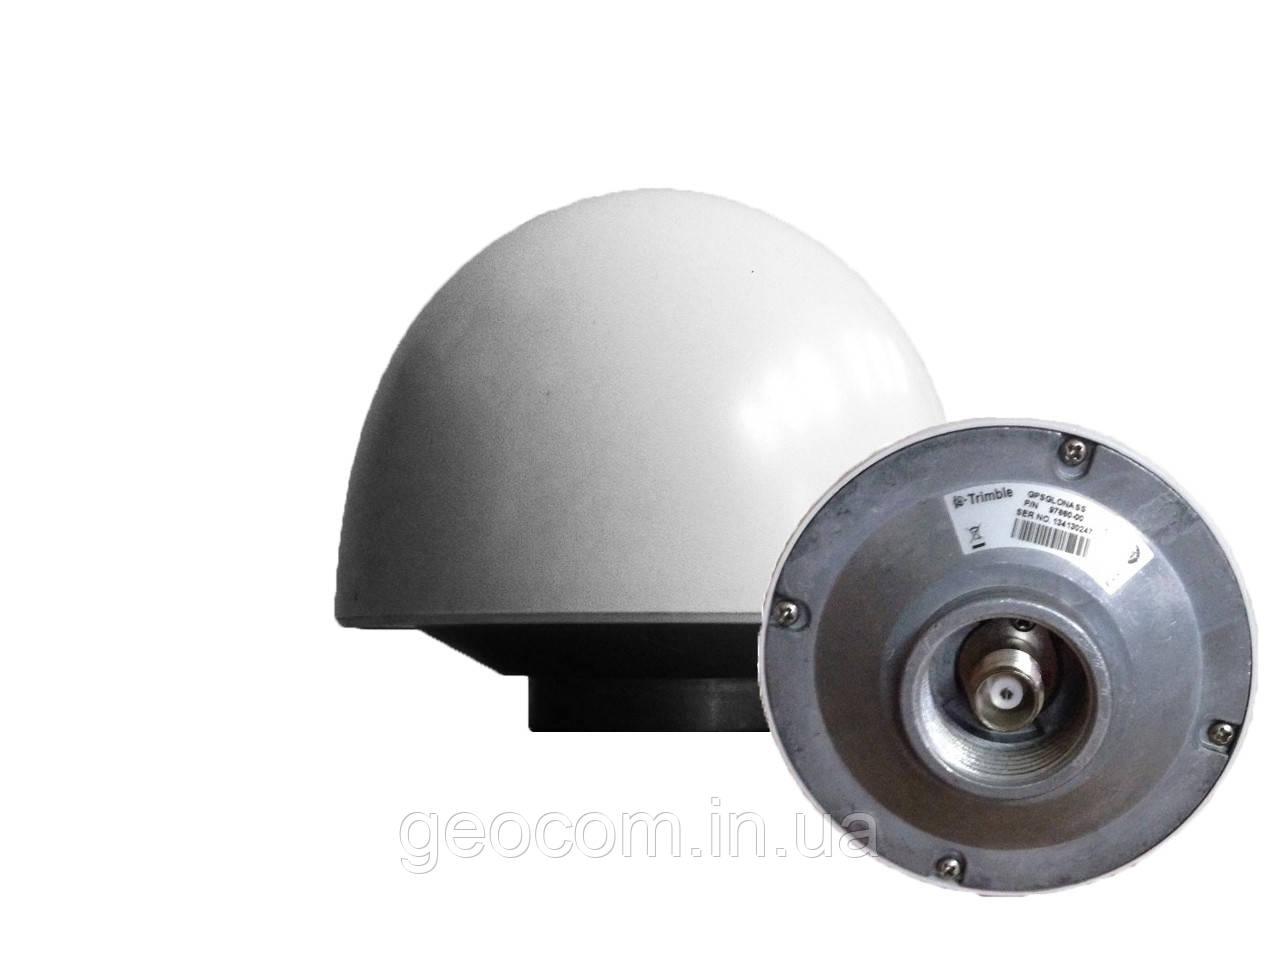 Антенна Trimble BULLET 3 GPS GLONASS